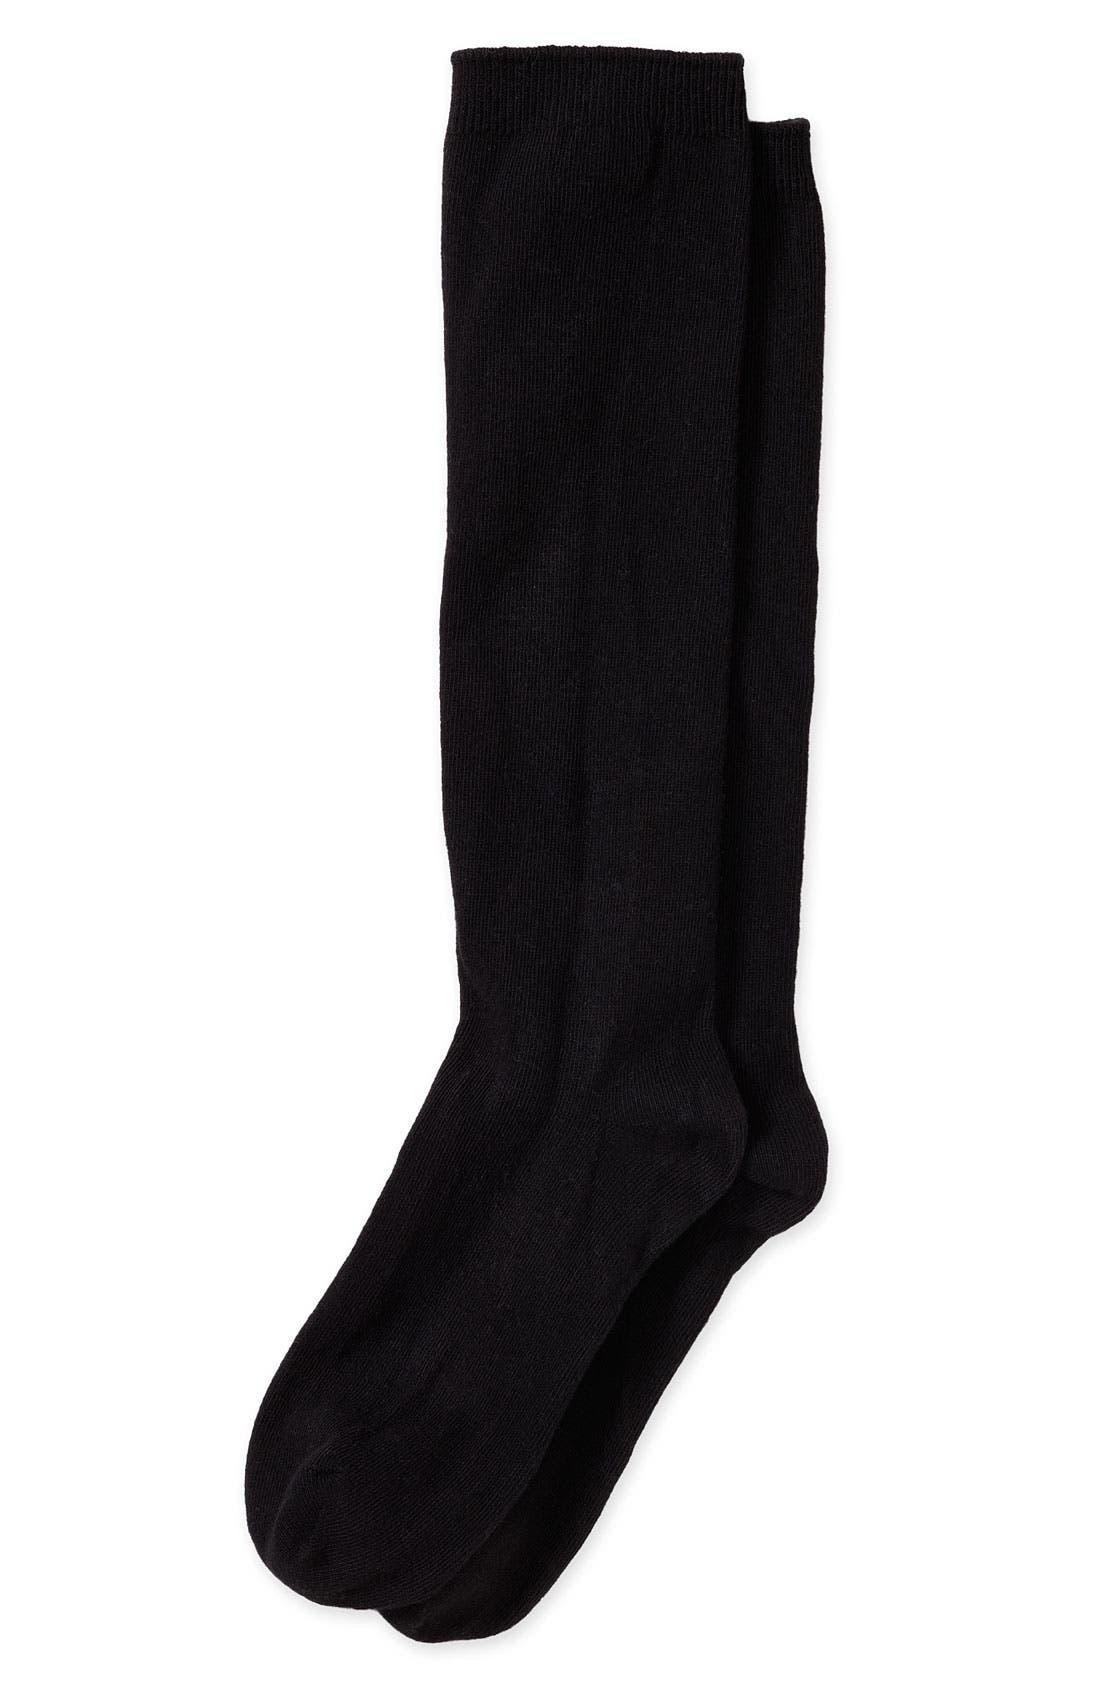 NORDSTROM,                             Knee High Socks,                             Main thumbnail 1, color,                             001